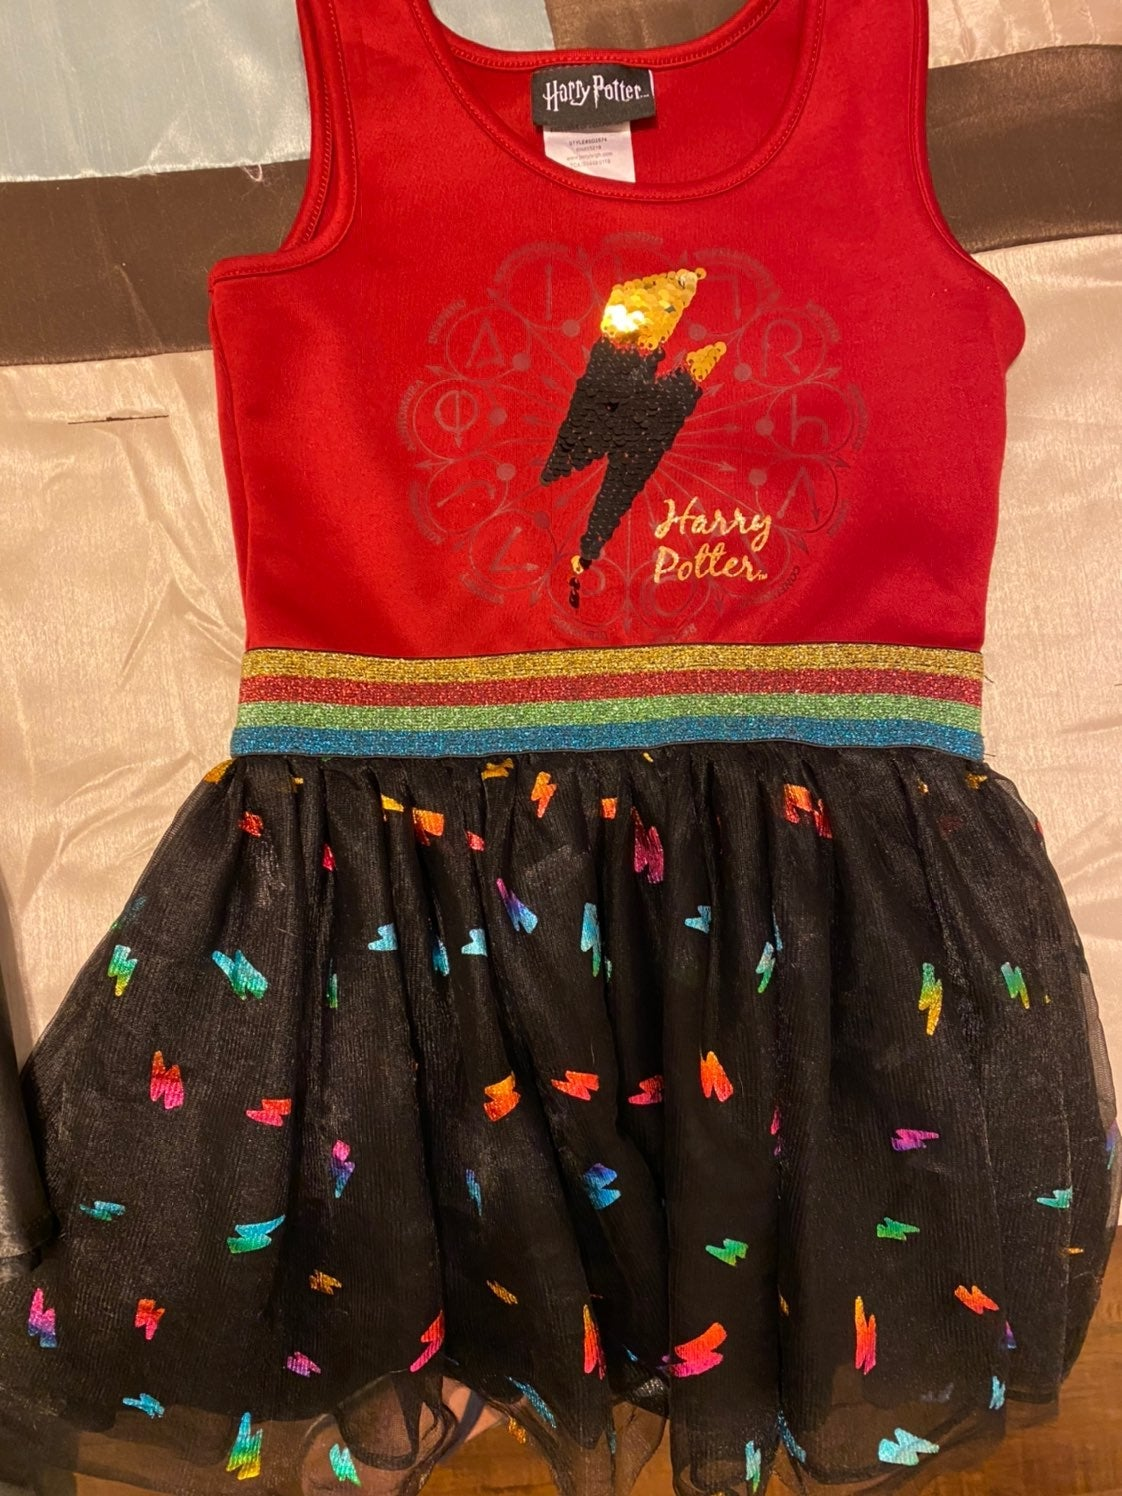 Harry Potter Dress-size 4-5 Toddler